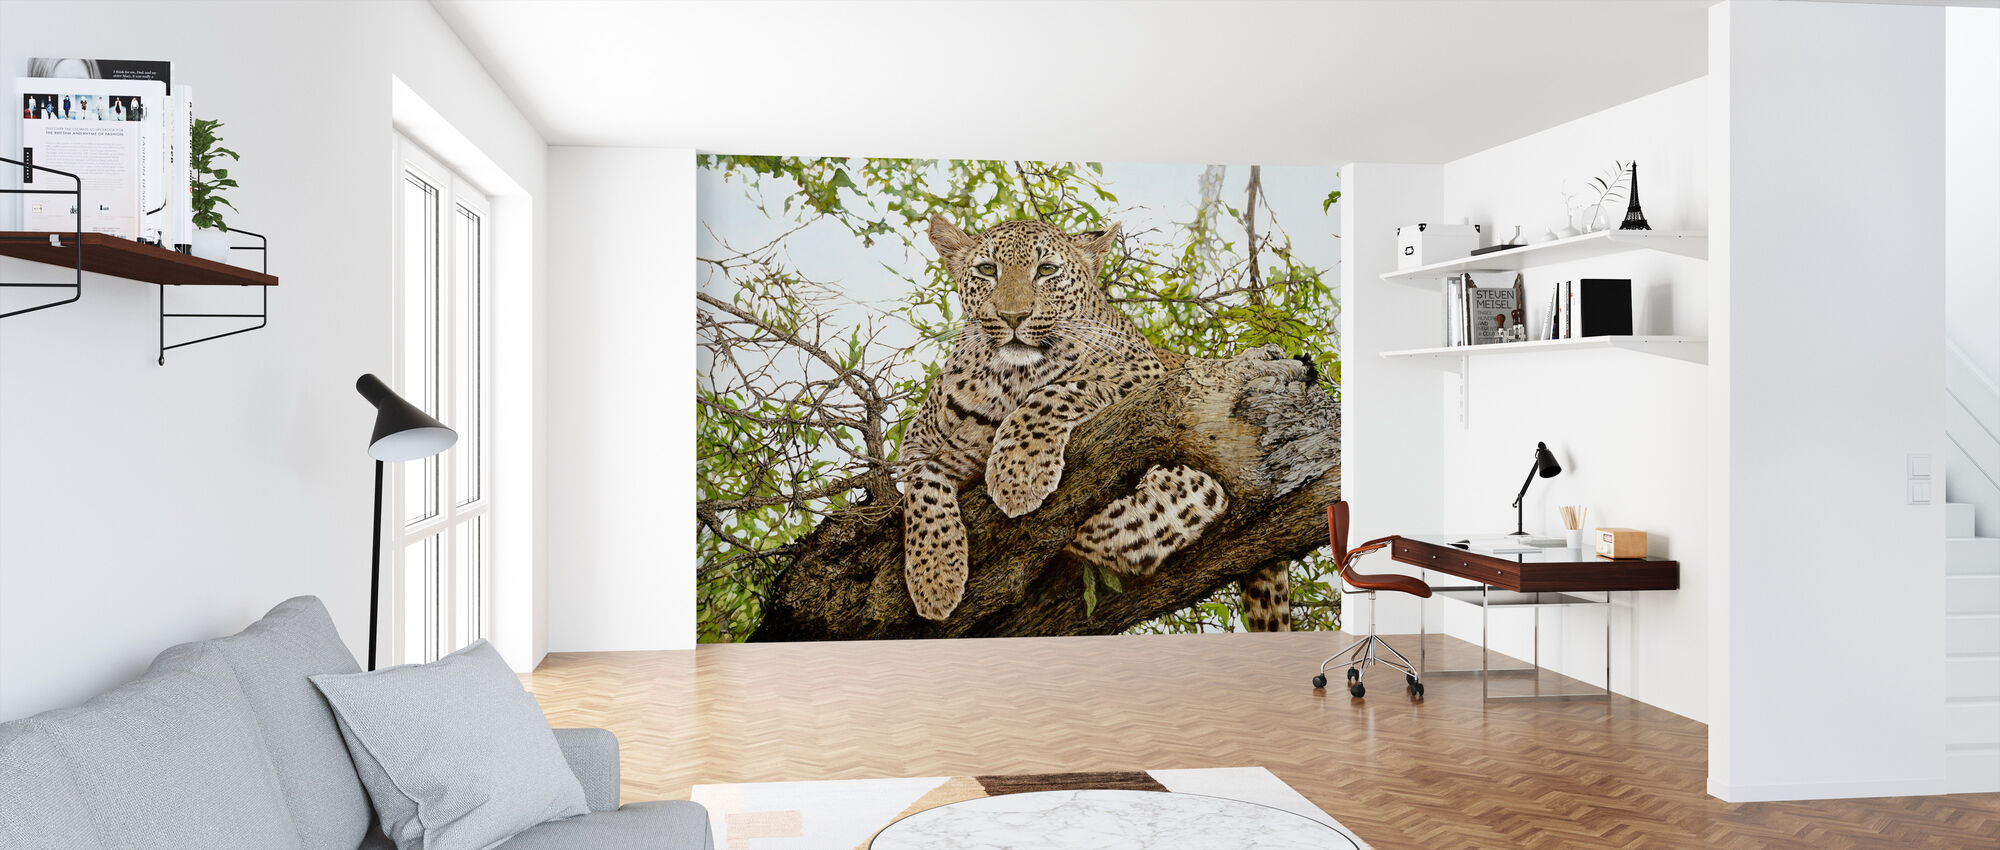 Anticipation Leopard - Wallpaper - Office